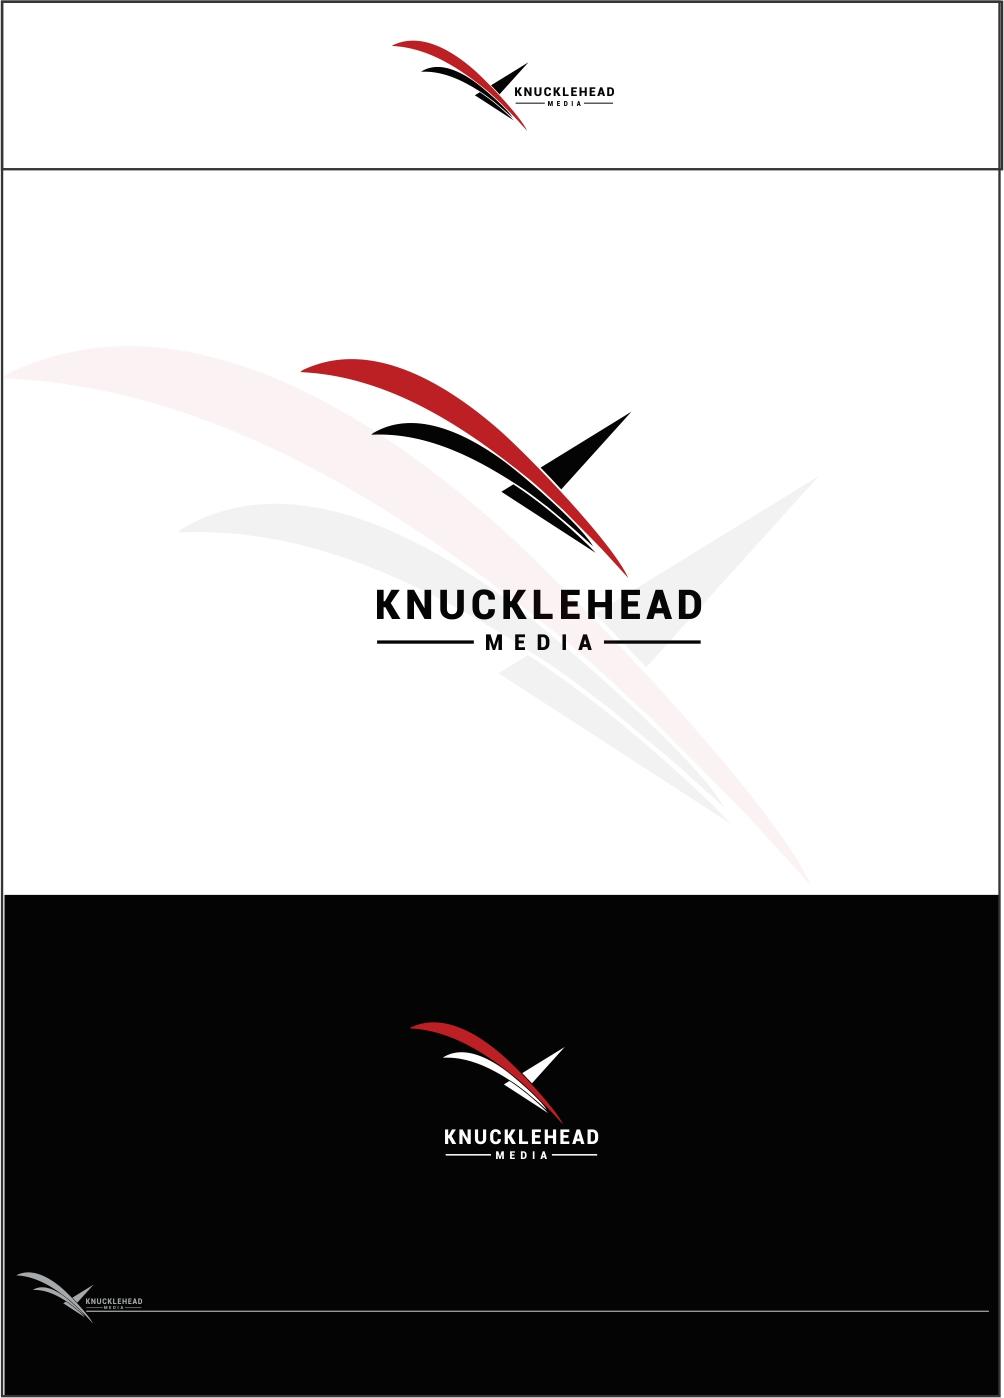 Logo Design by ian69 - Entry No. 62 in the Logo Design Contest Imaginative Logo Design for knucklehead media.